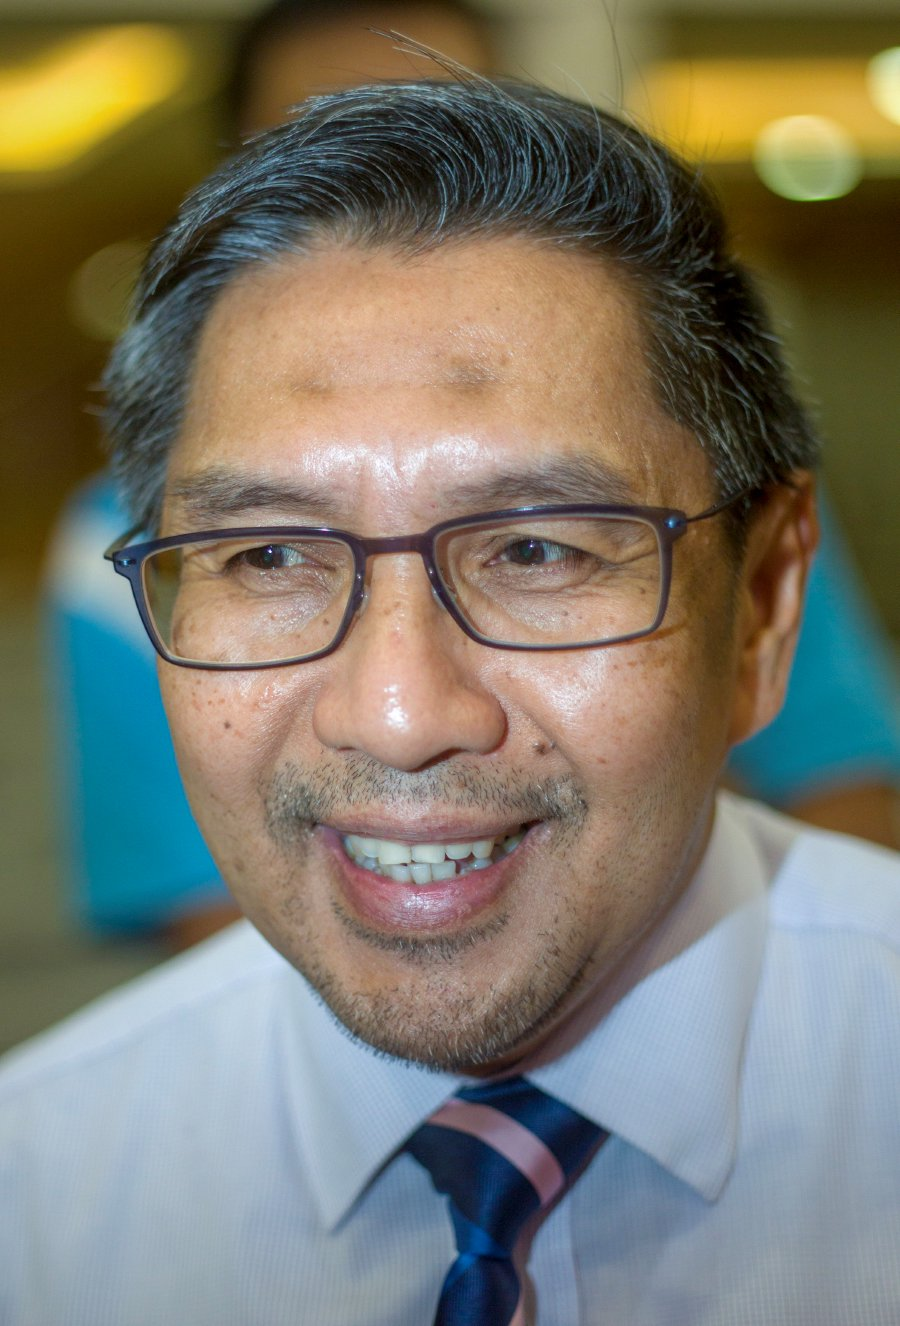 Azharuddin A. Rahman, chairman of the Civil Aviation Authority of Malaysia.